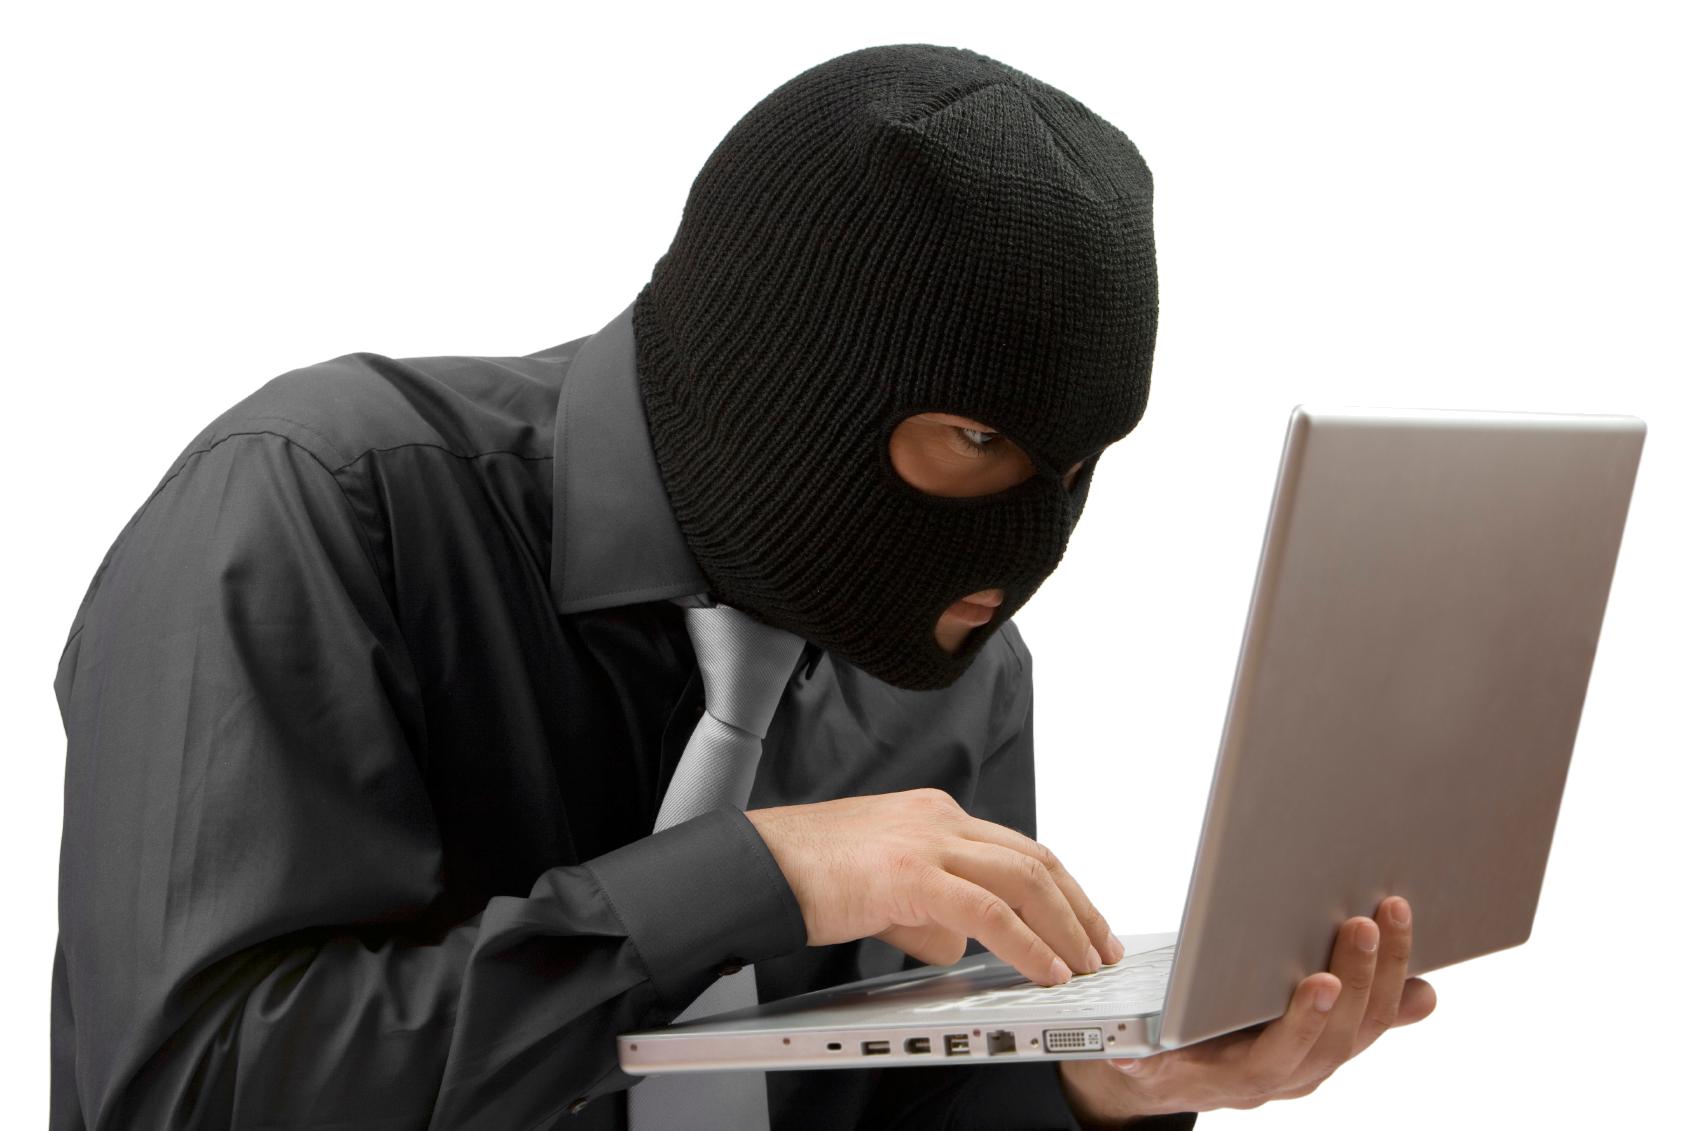 robber-hacker-png-4